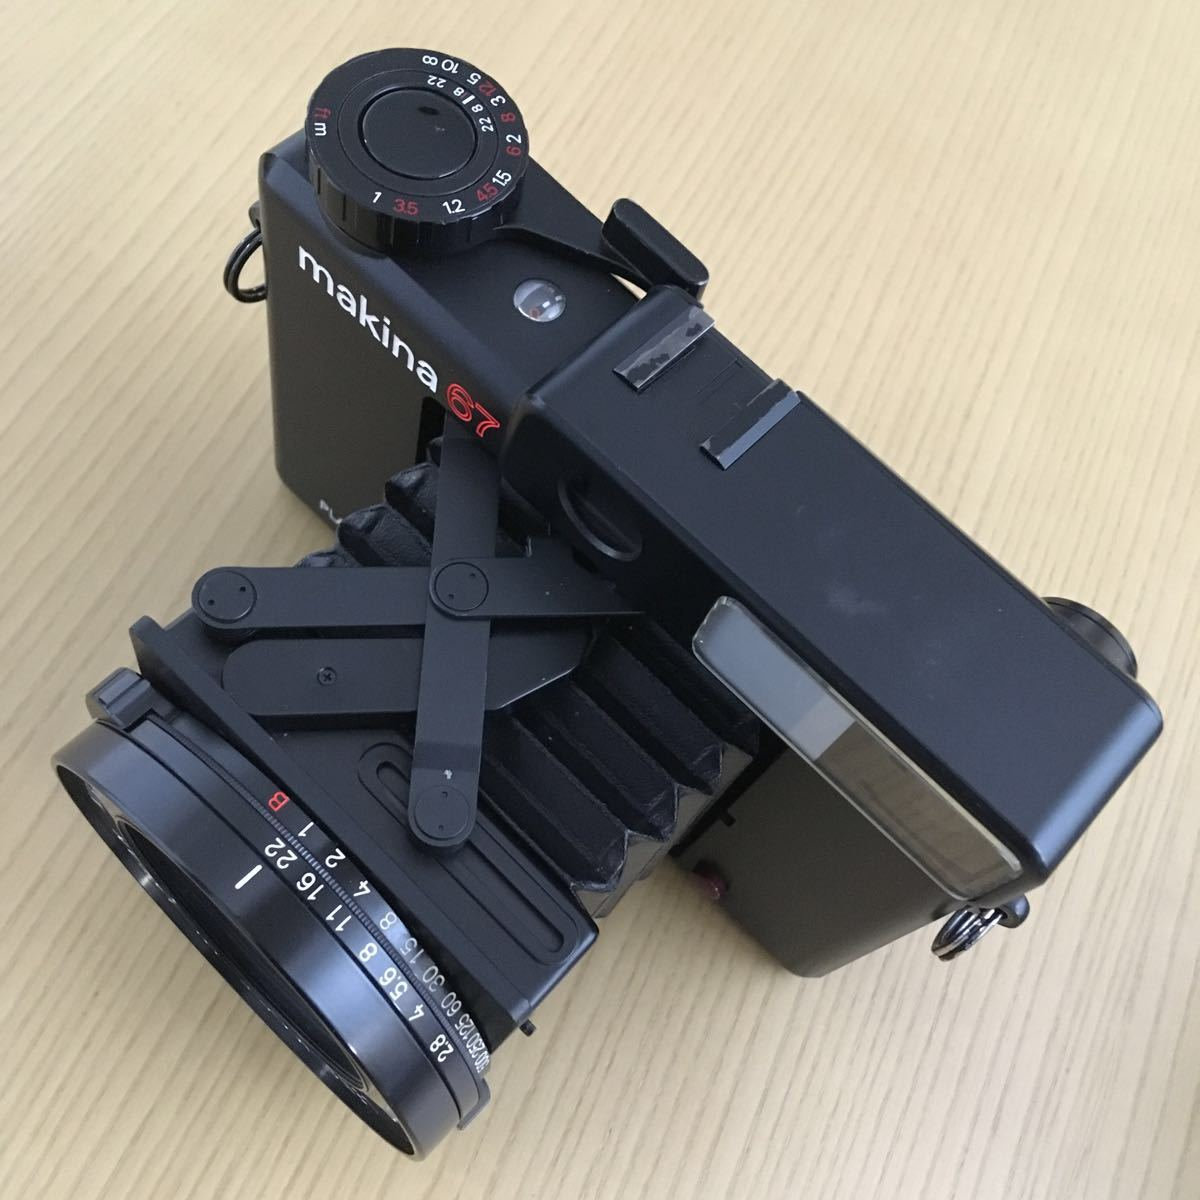 PLAUBEL makina 67 (Nikon Nikkor 80mm f2.8)プラウベル・マキナ 中判カメラ 完動品 シャッター切れスピード変化し露出計も動作しました。_画像3